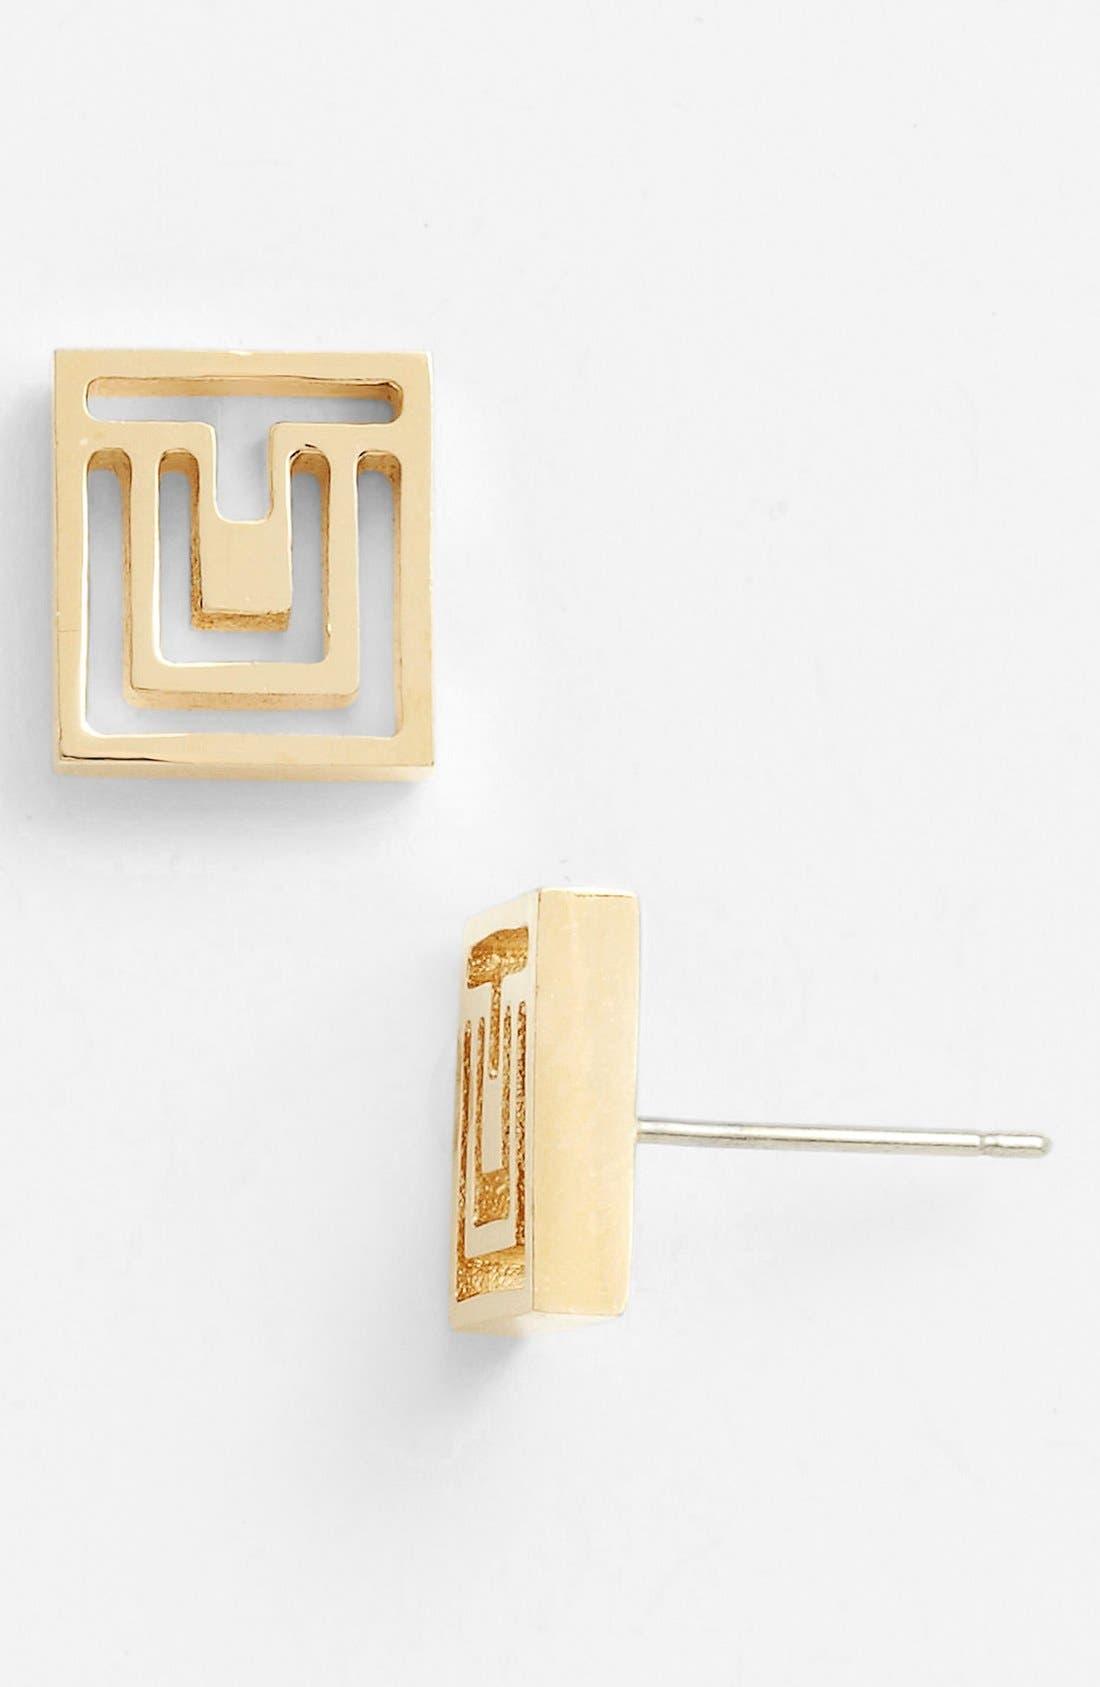 Alternate Image 1 Selected - Tory Burch 'Frete' Stud Earrings